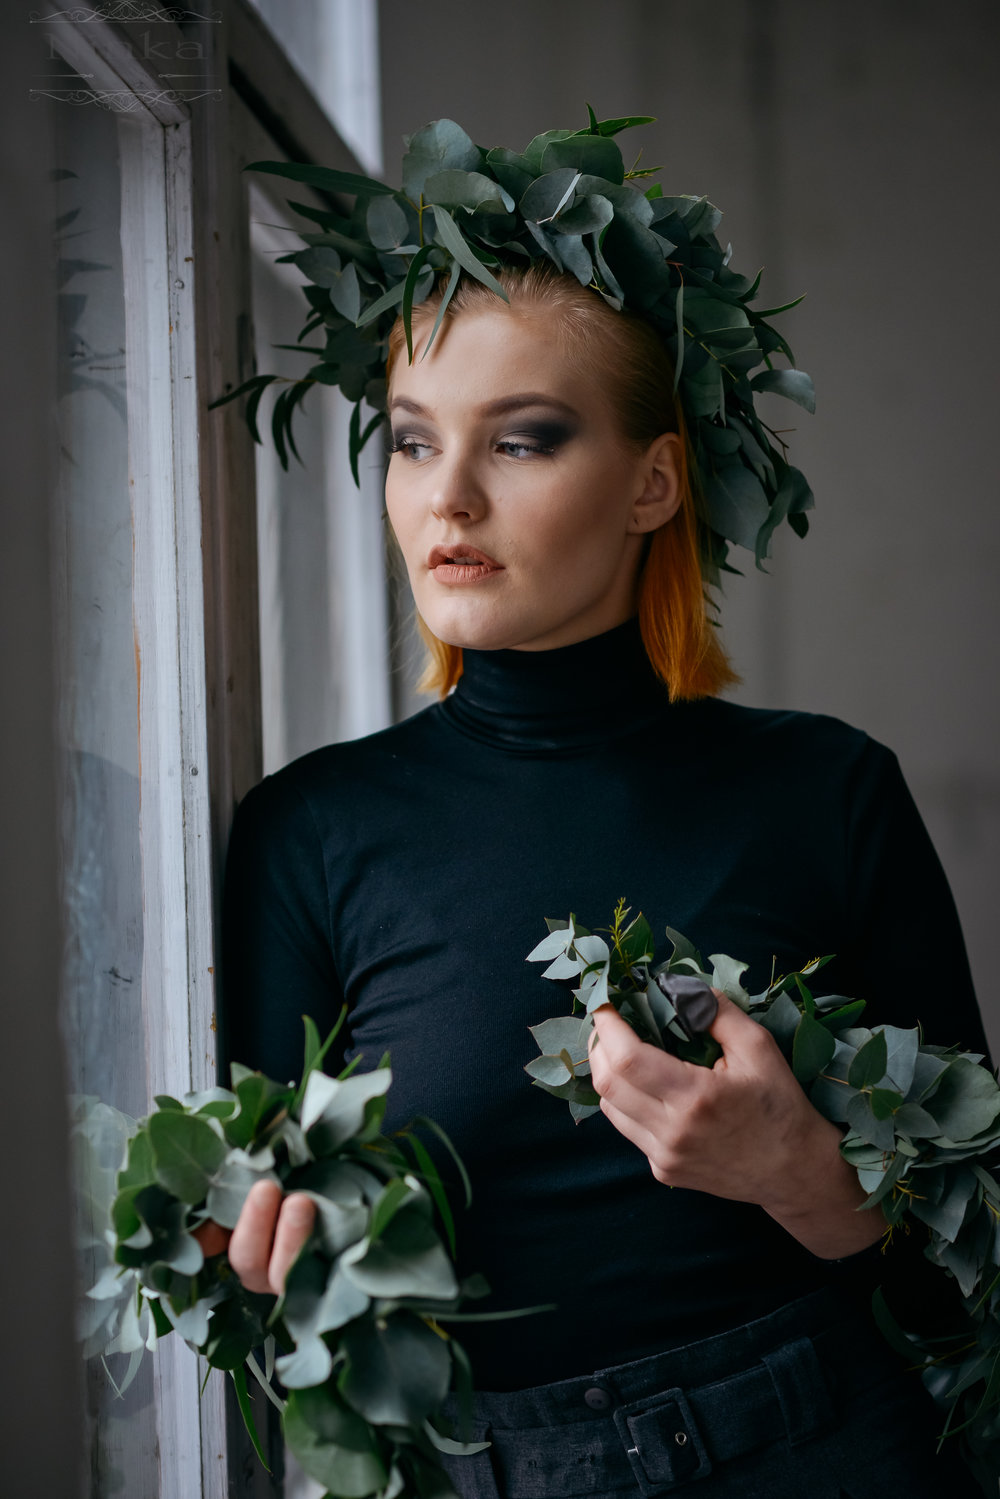 Kukat Penttala Floral Design, malli/Muah Janina Junttila